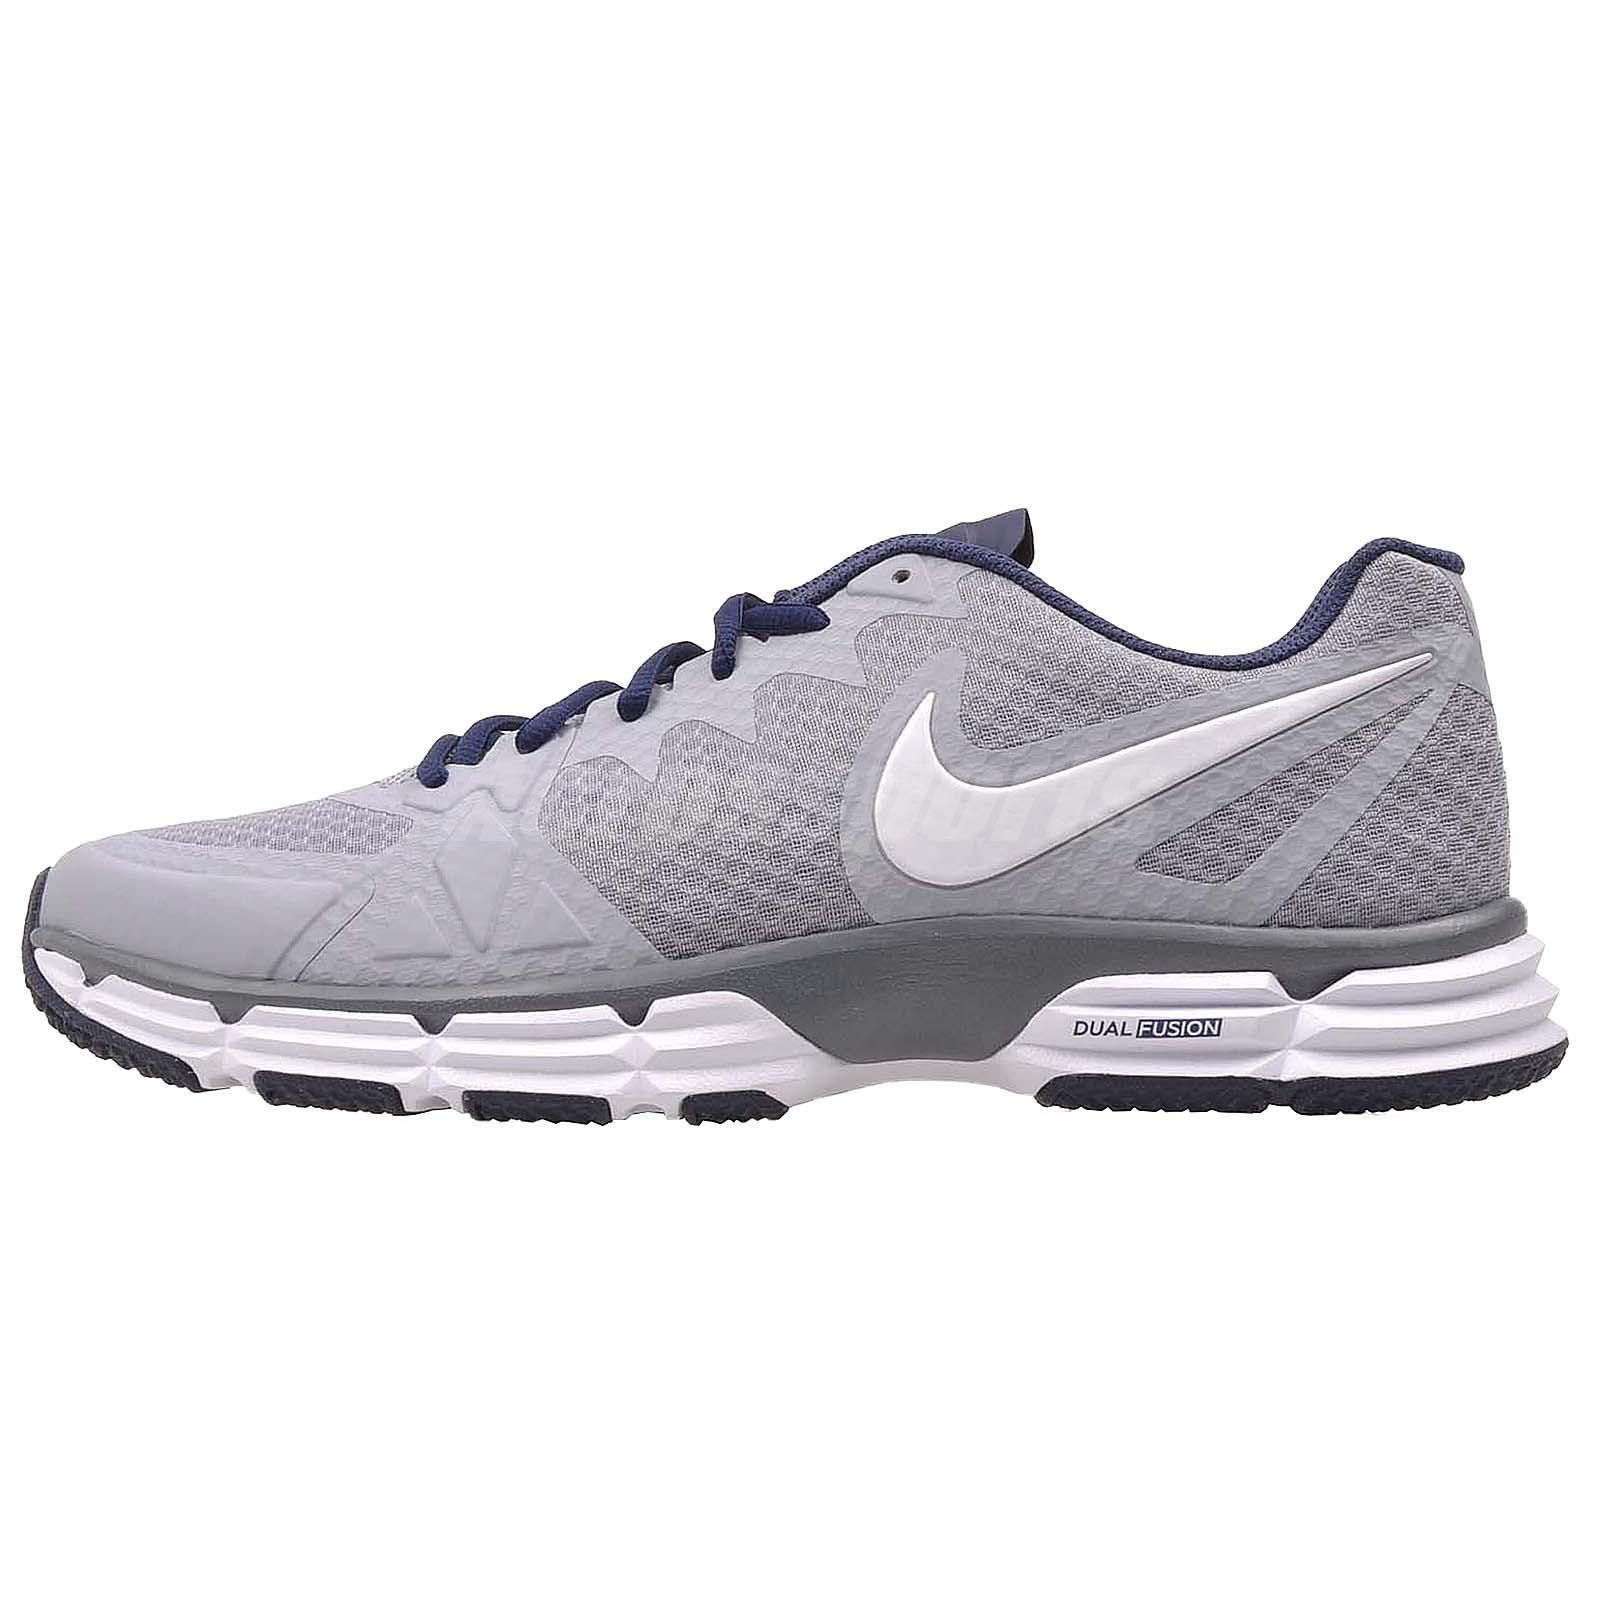 online store 888ec 3afa5 Gallery Nike Dual Fusion TR III Men s Training Shoes Sneakers Gray Size 11